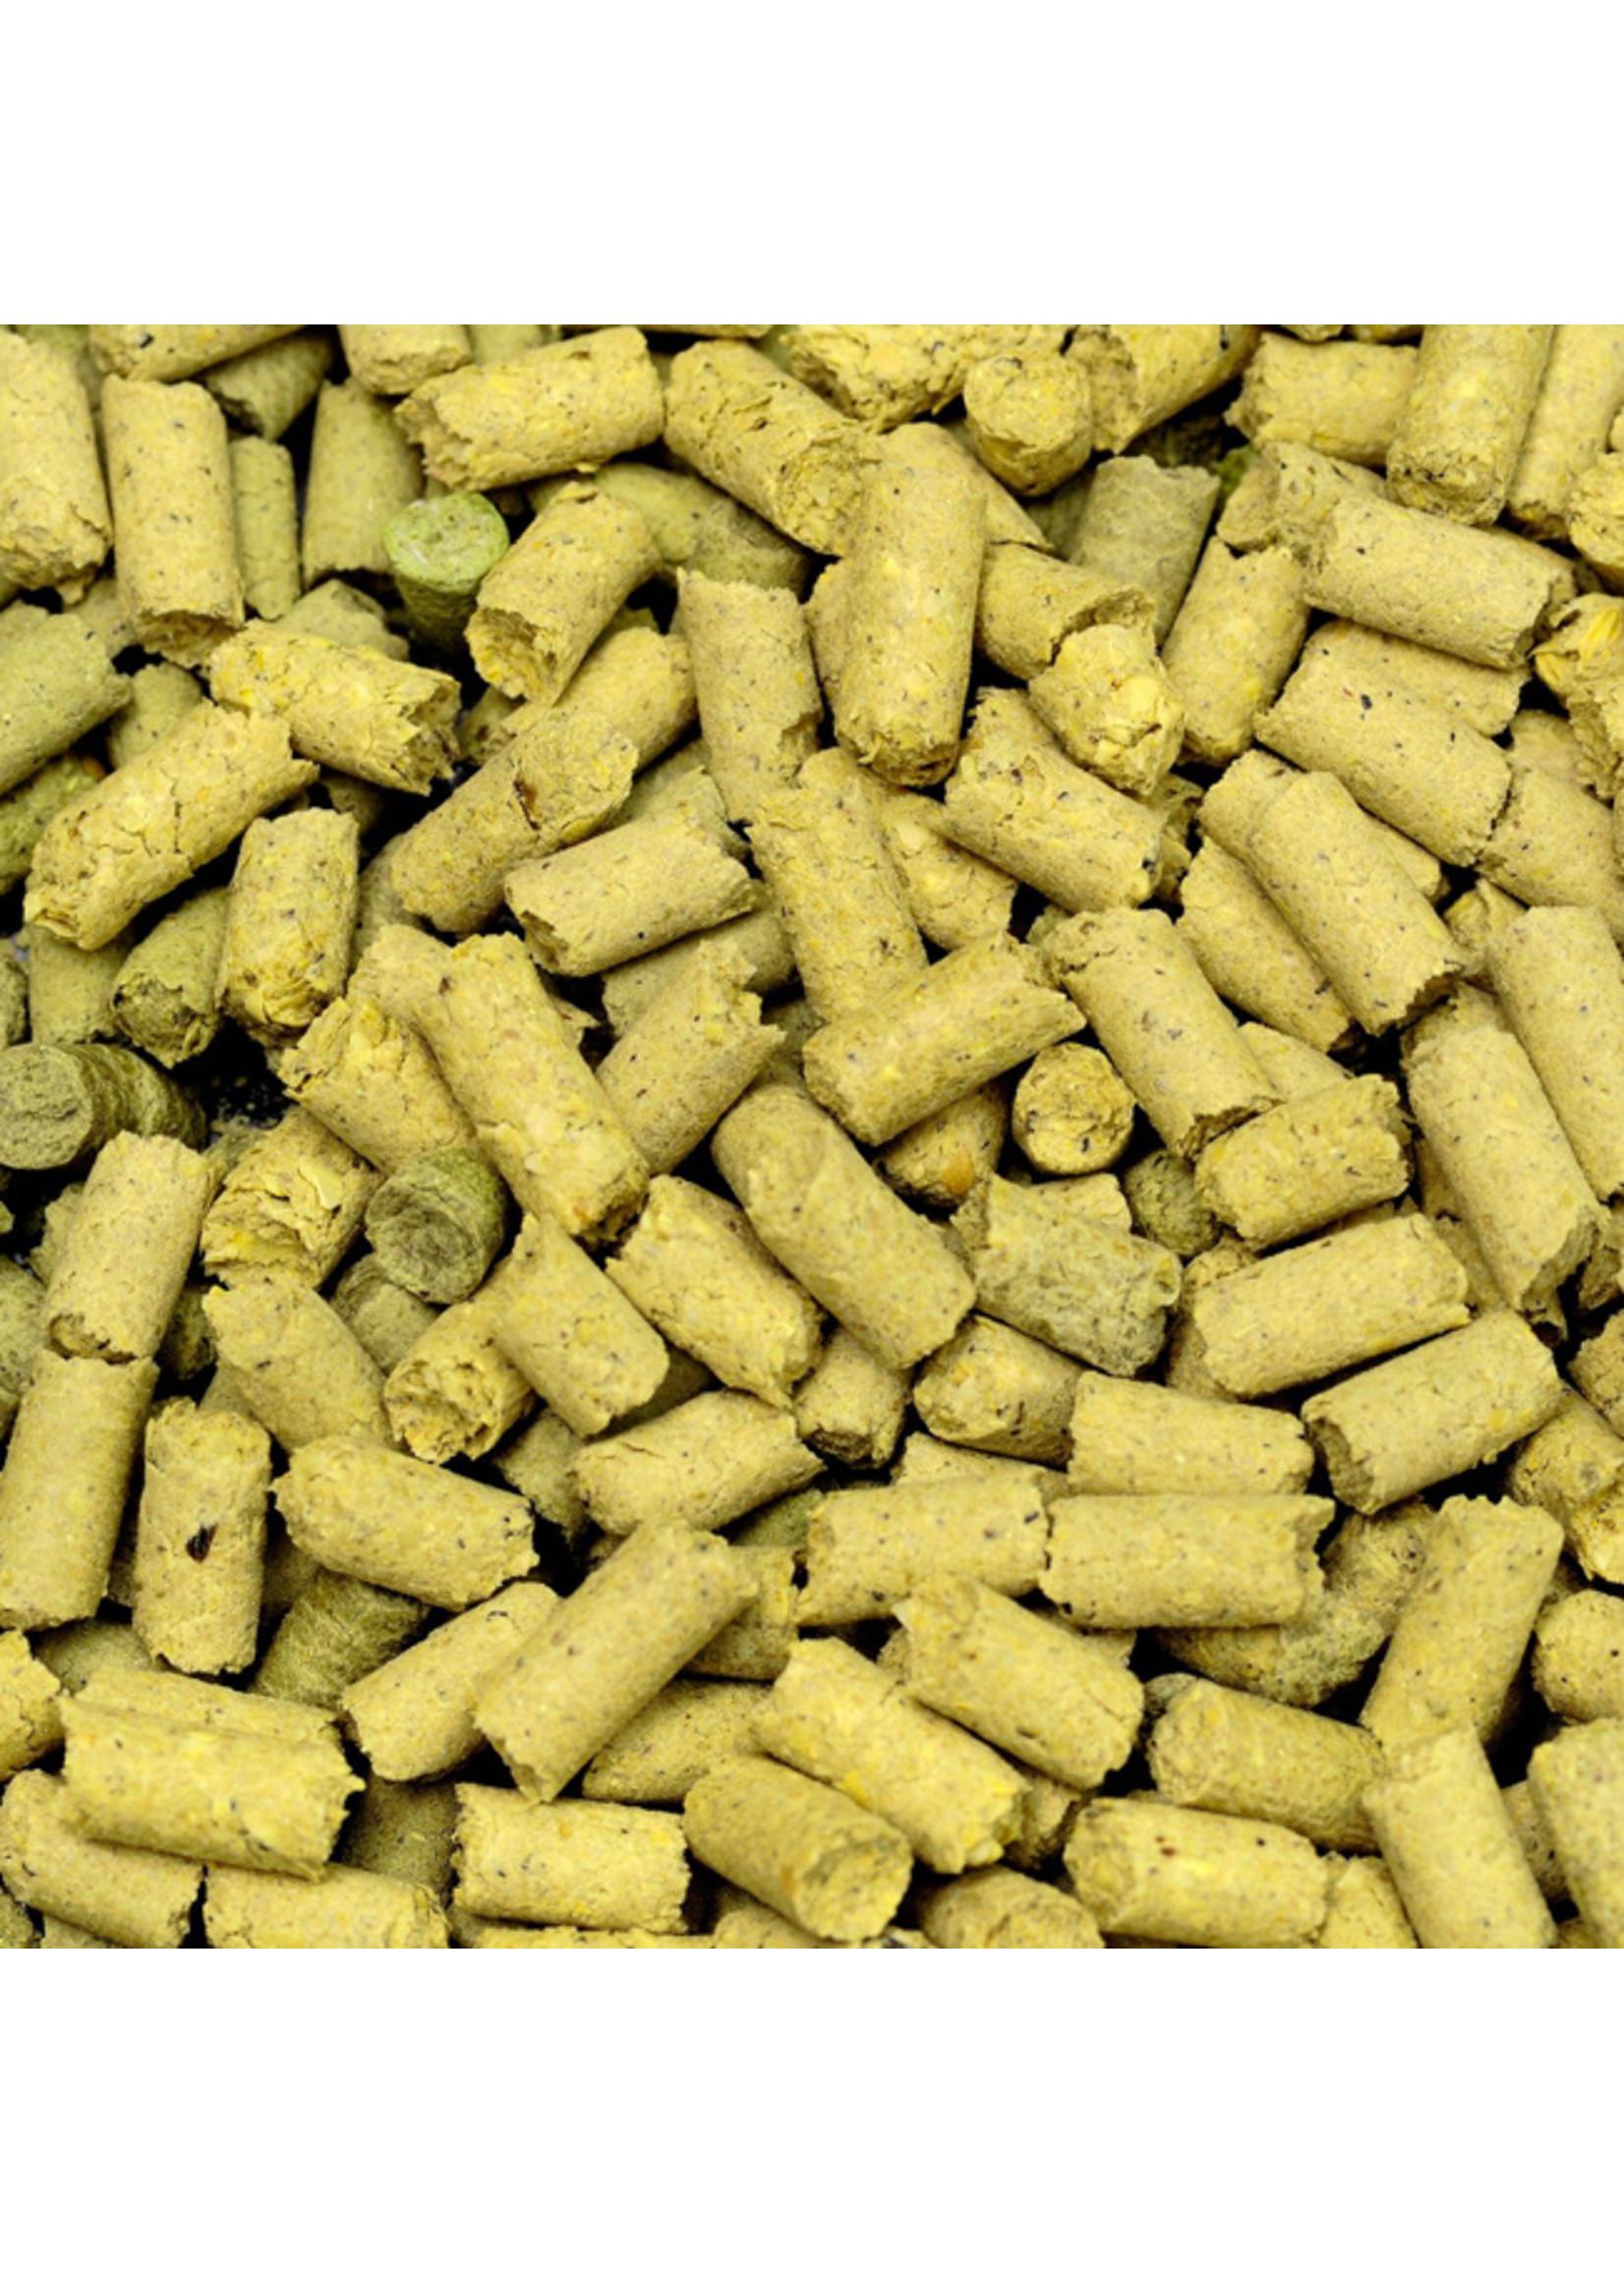 Shrimp King Shrimp King Moringa Pops Sticks 40g